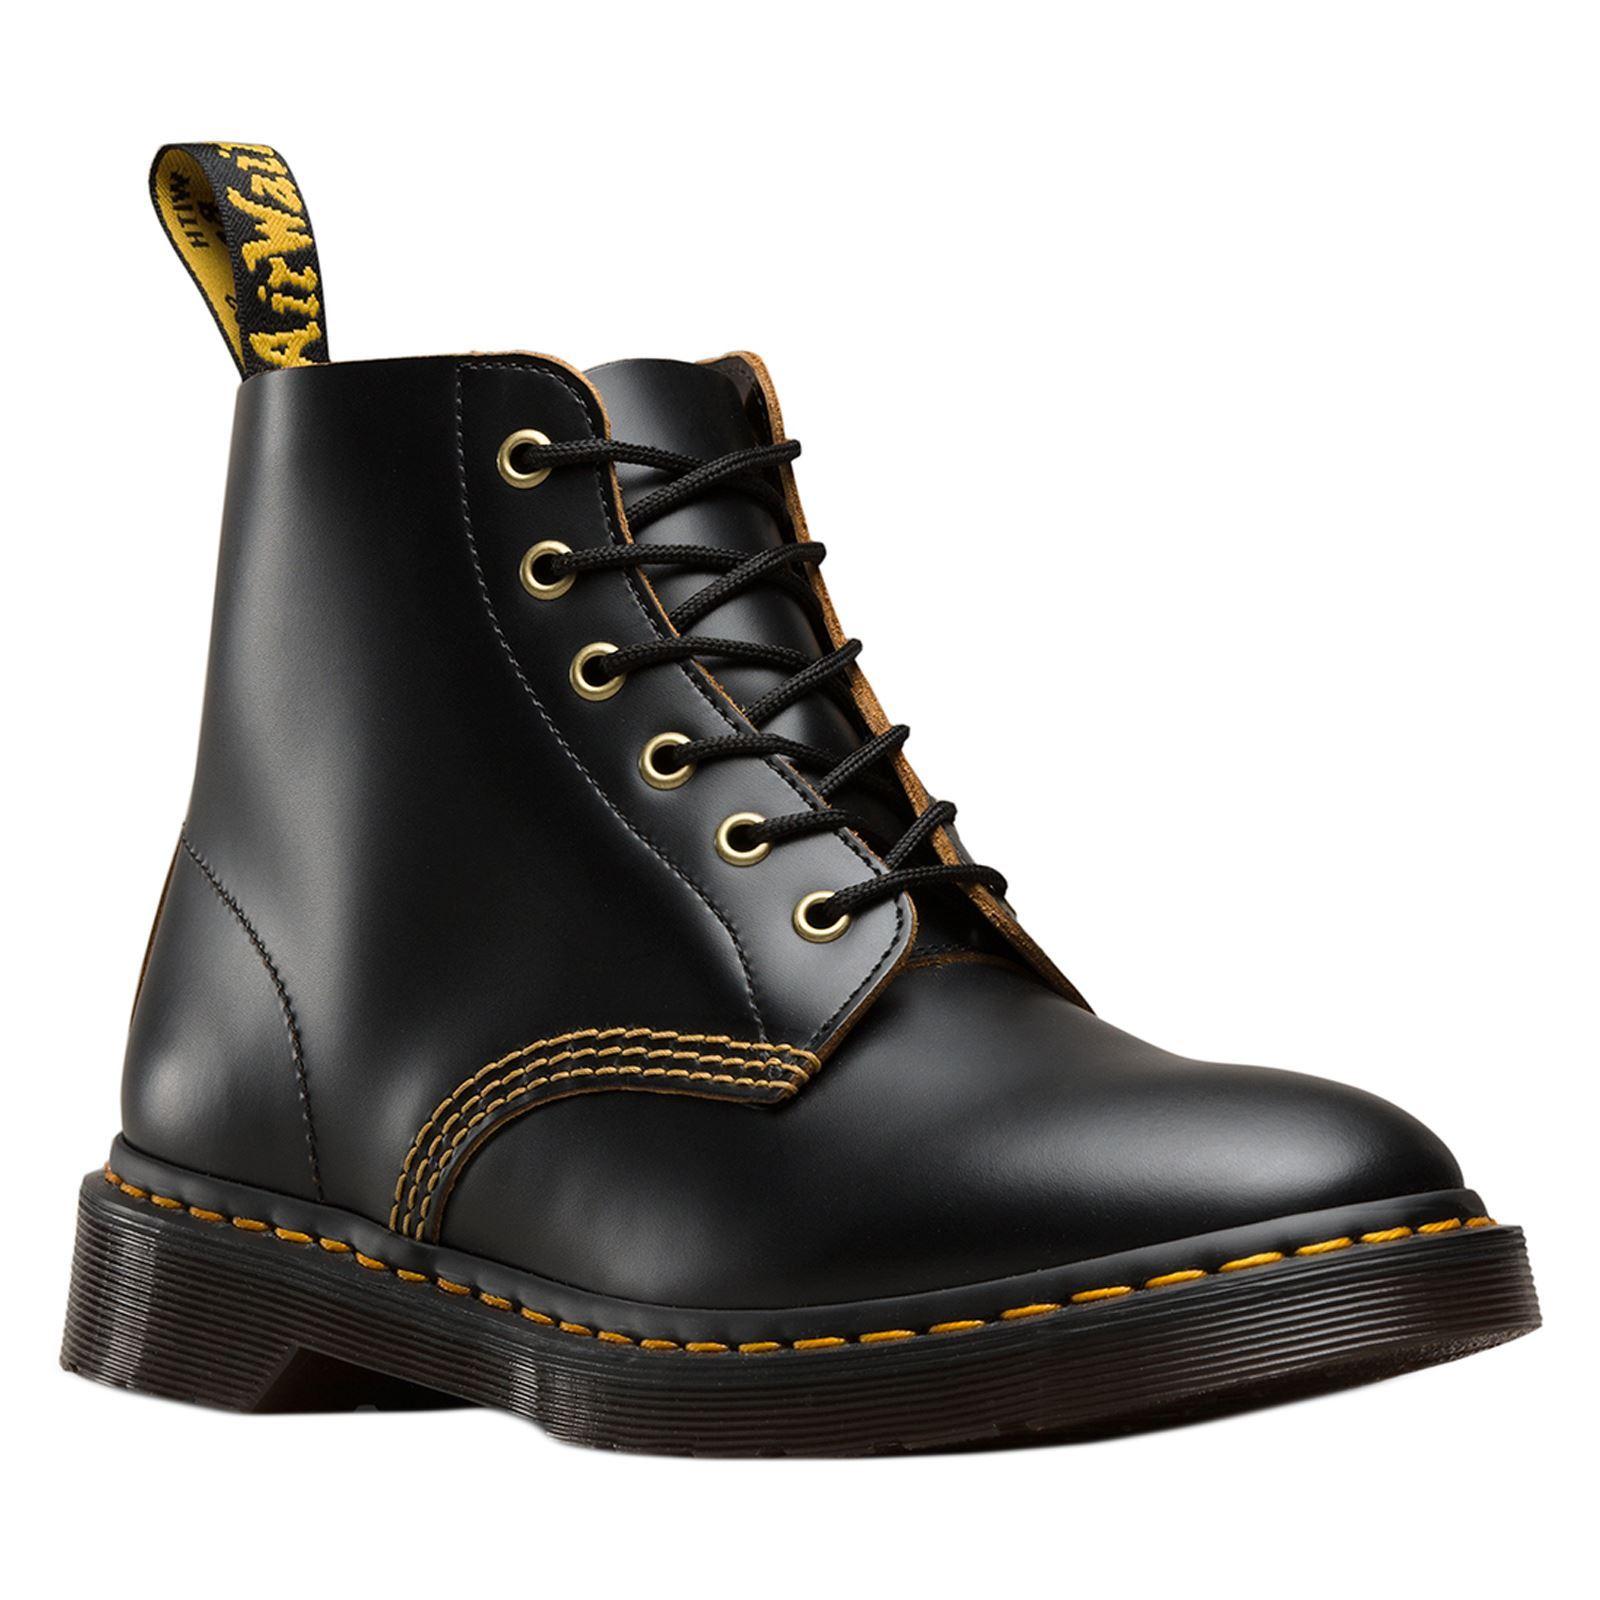 Details zu Dr.Martens Unisex 101 Arc 6 Eyelet Leather Boots